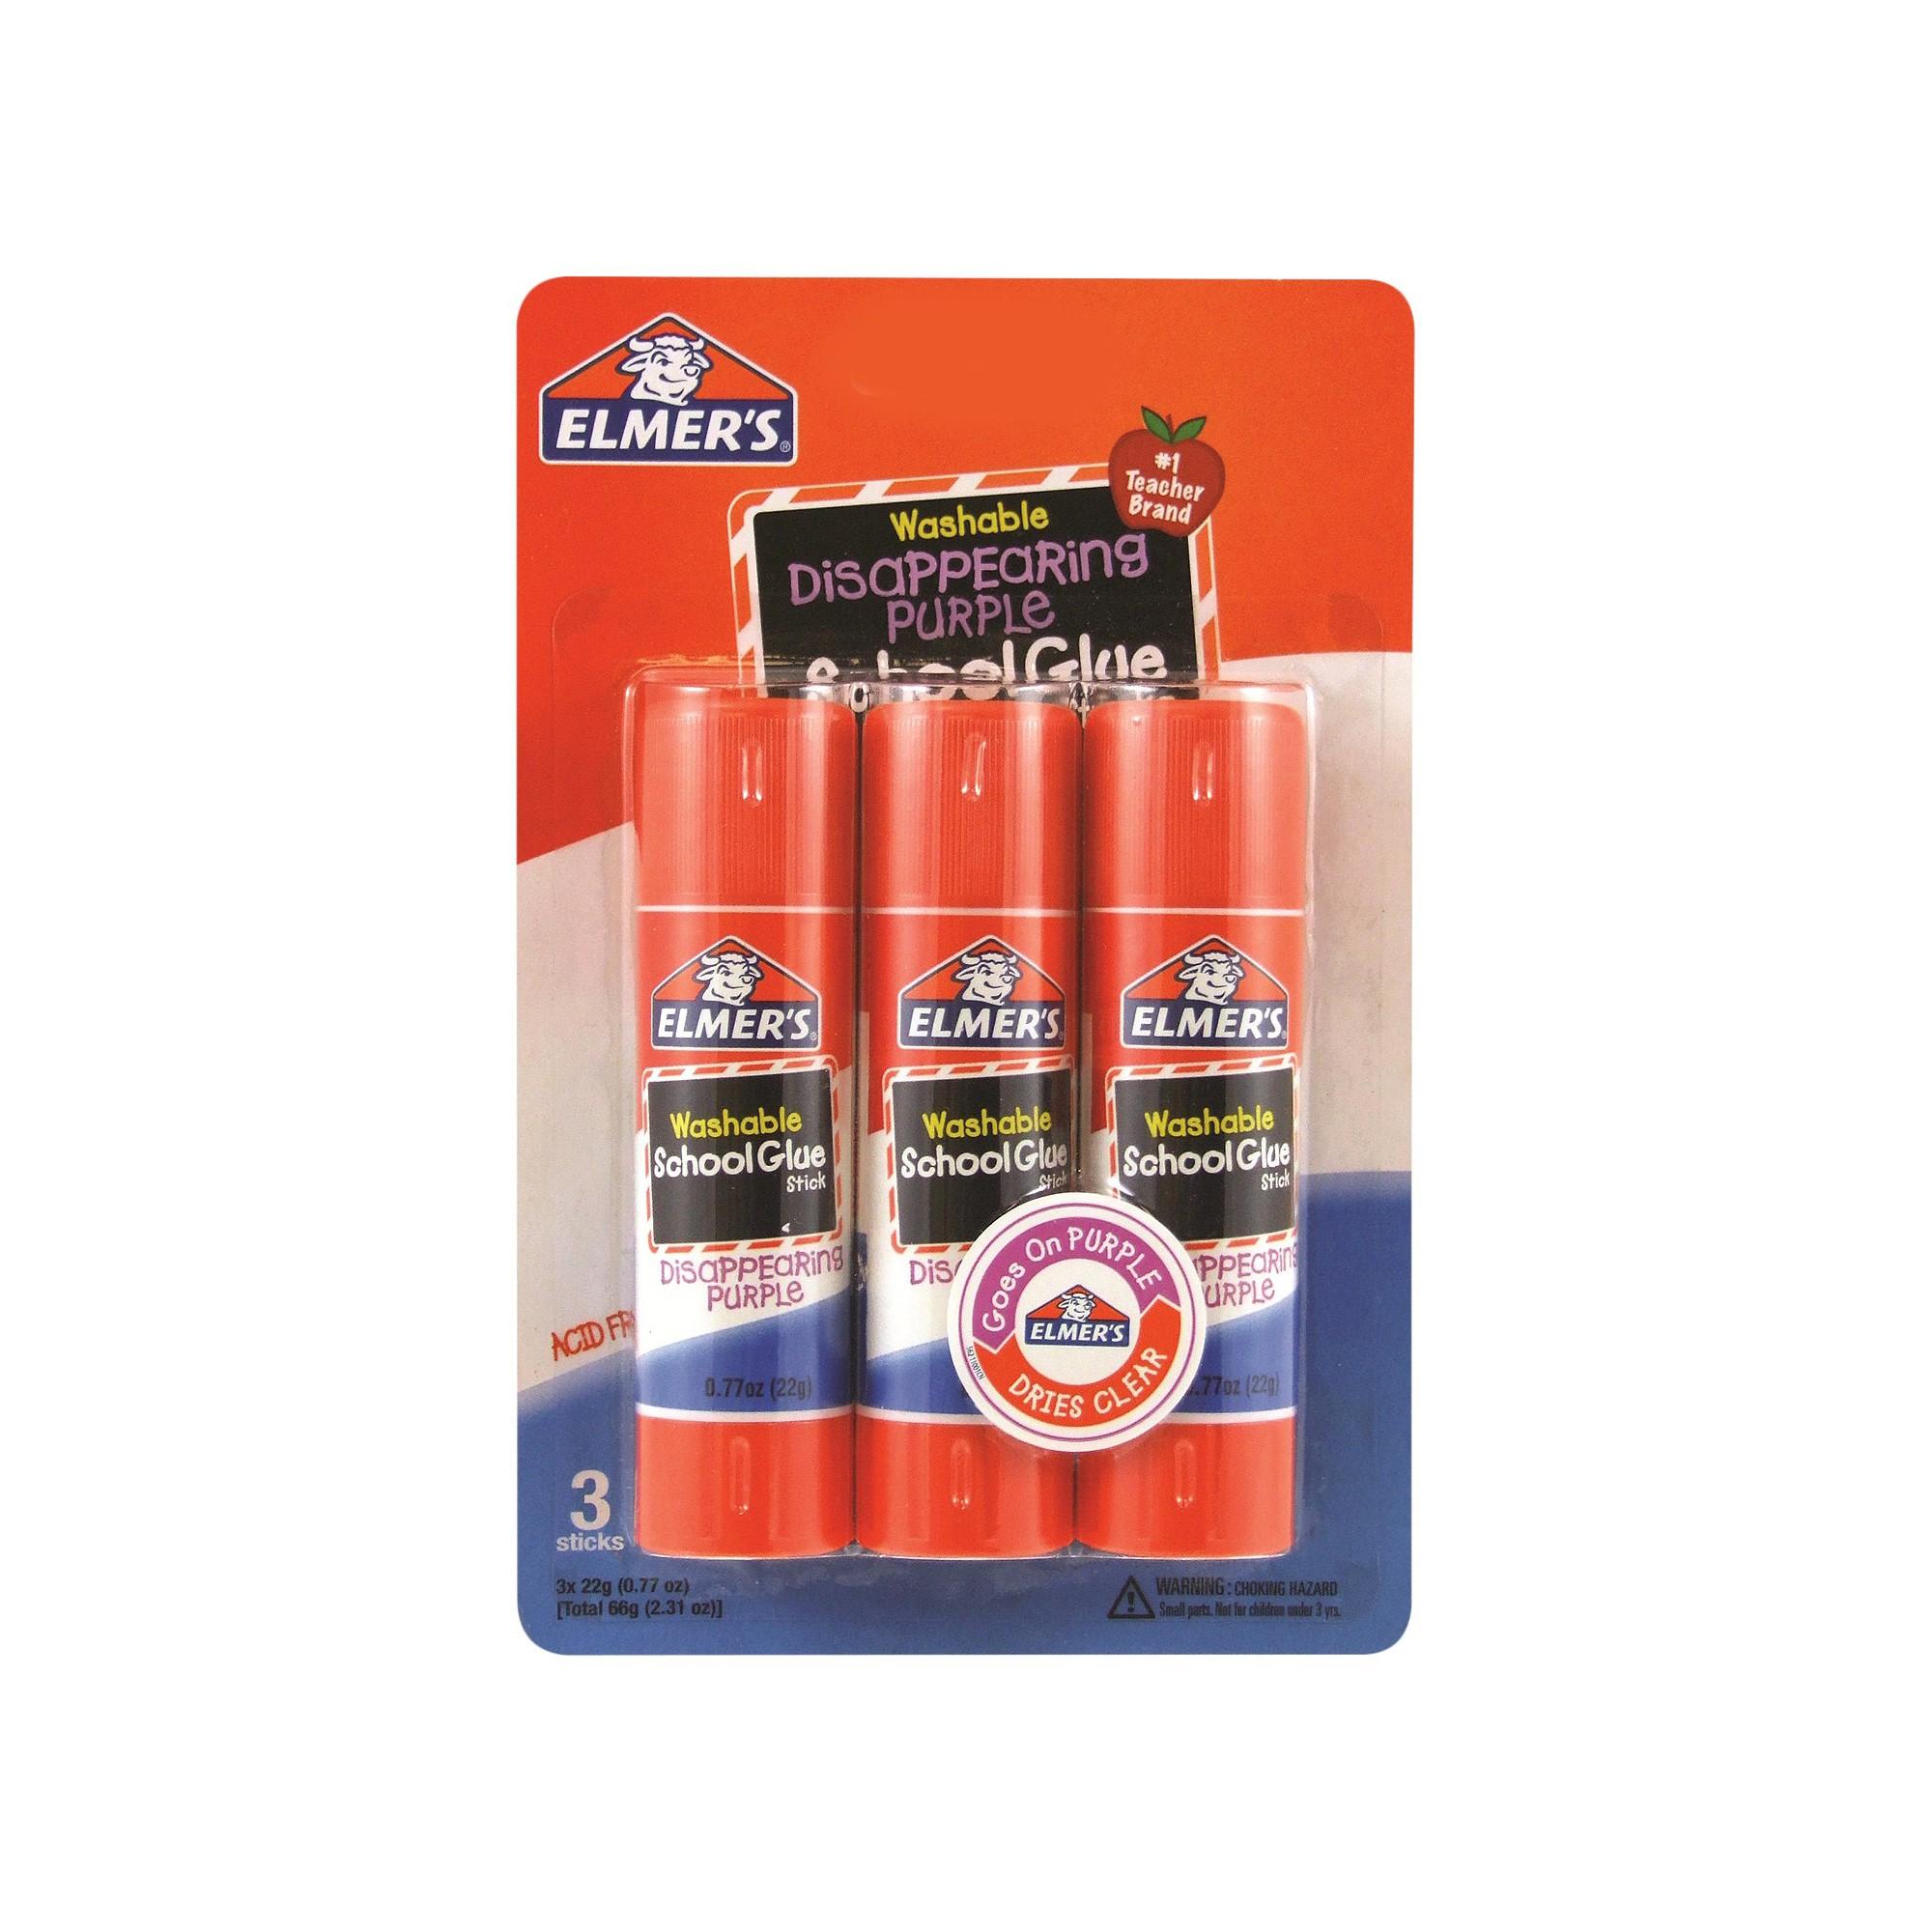 Elmer's Washable Glue Sticks Disappearing Purple - 3ct, White